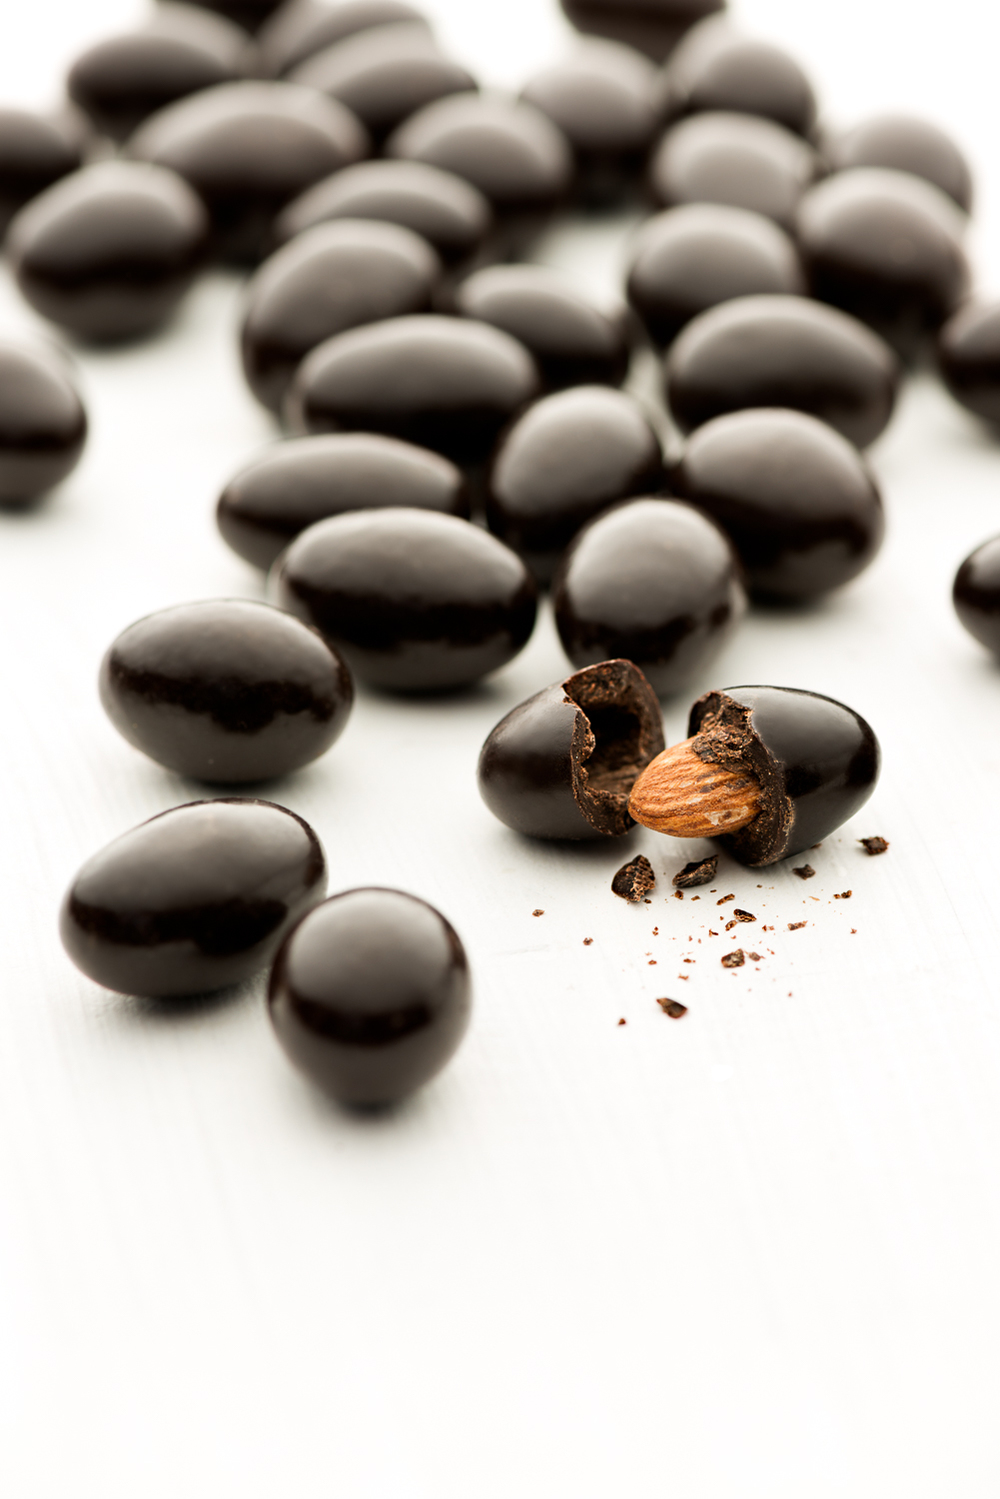 Chocolate covered almonds 2.jpg